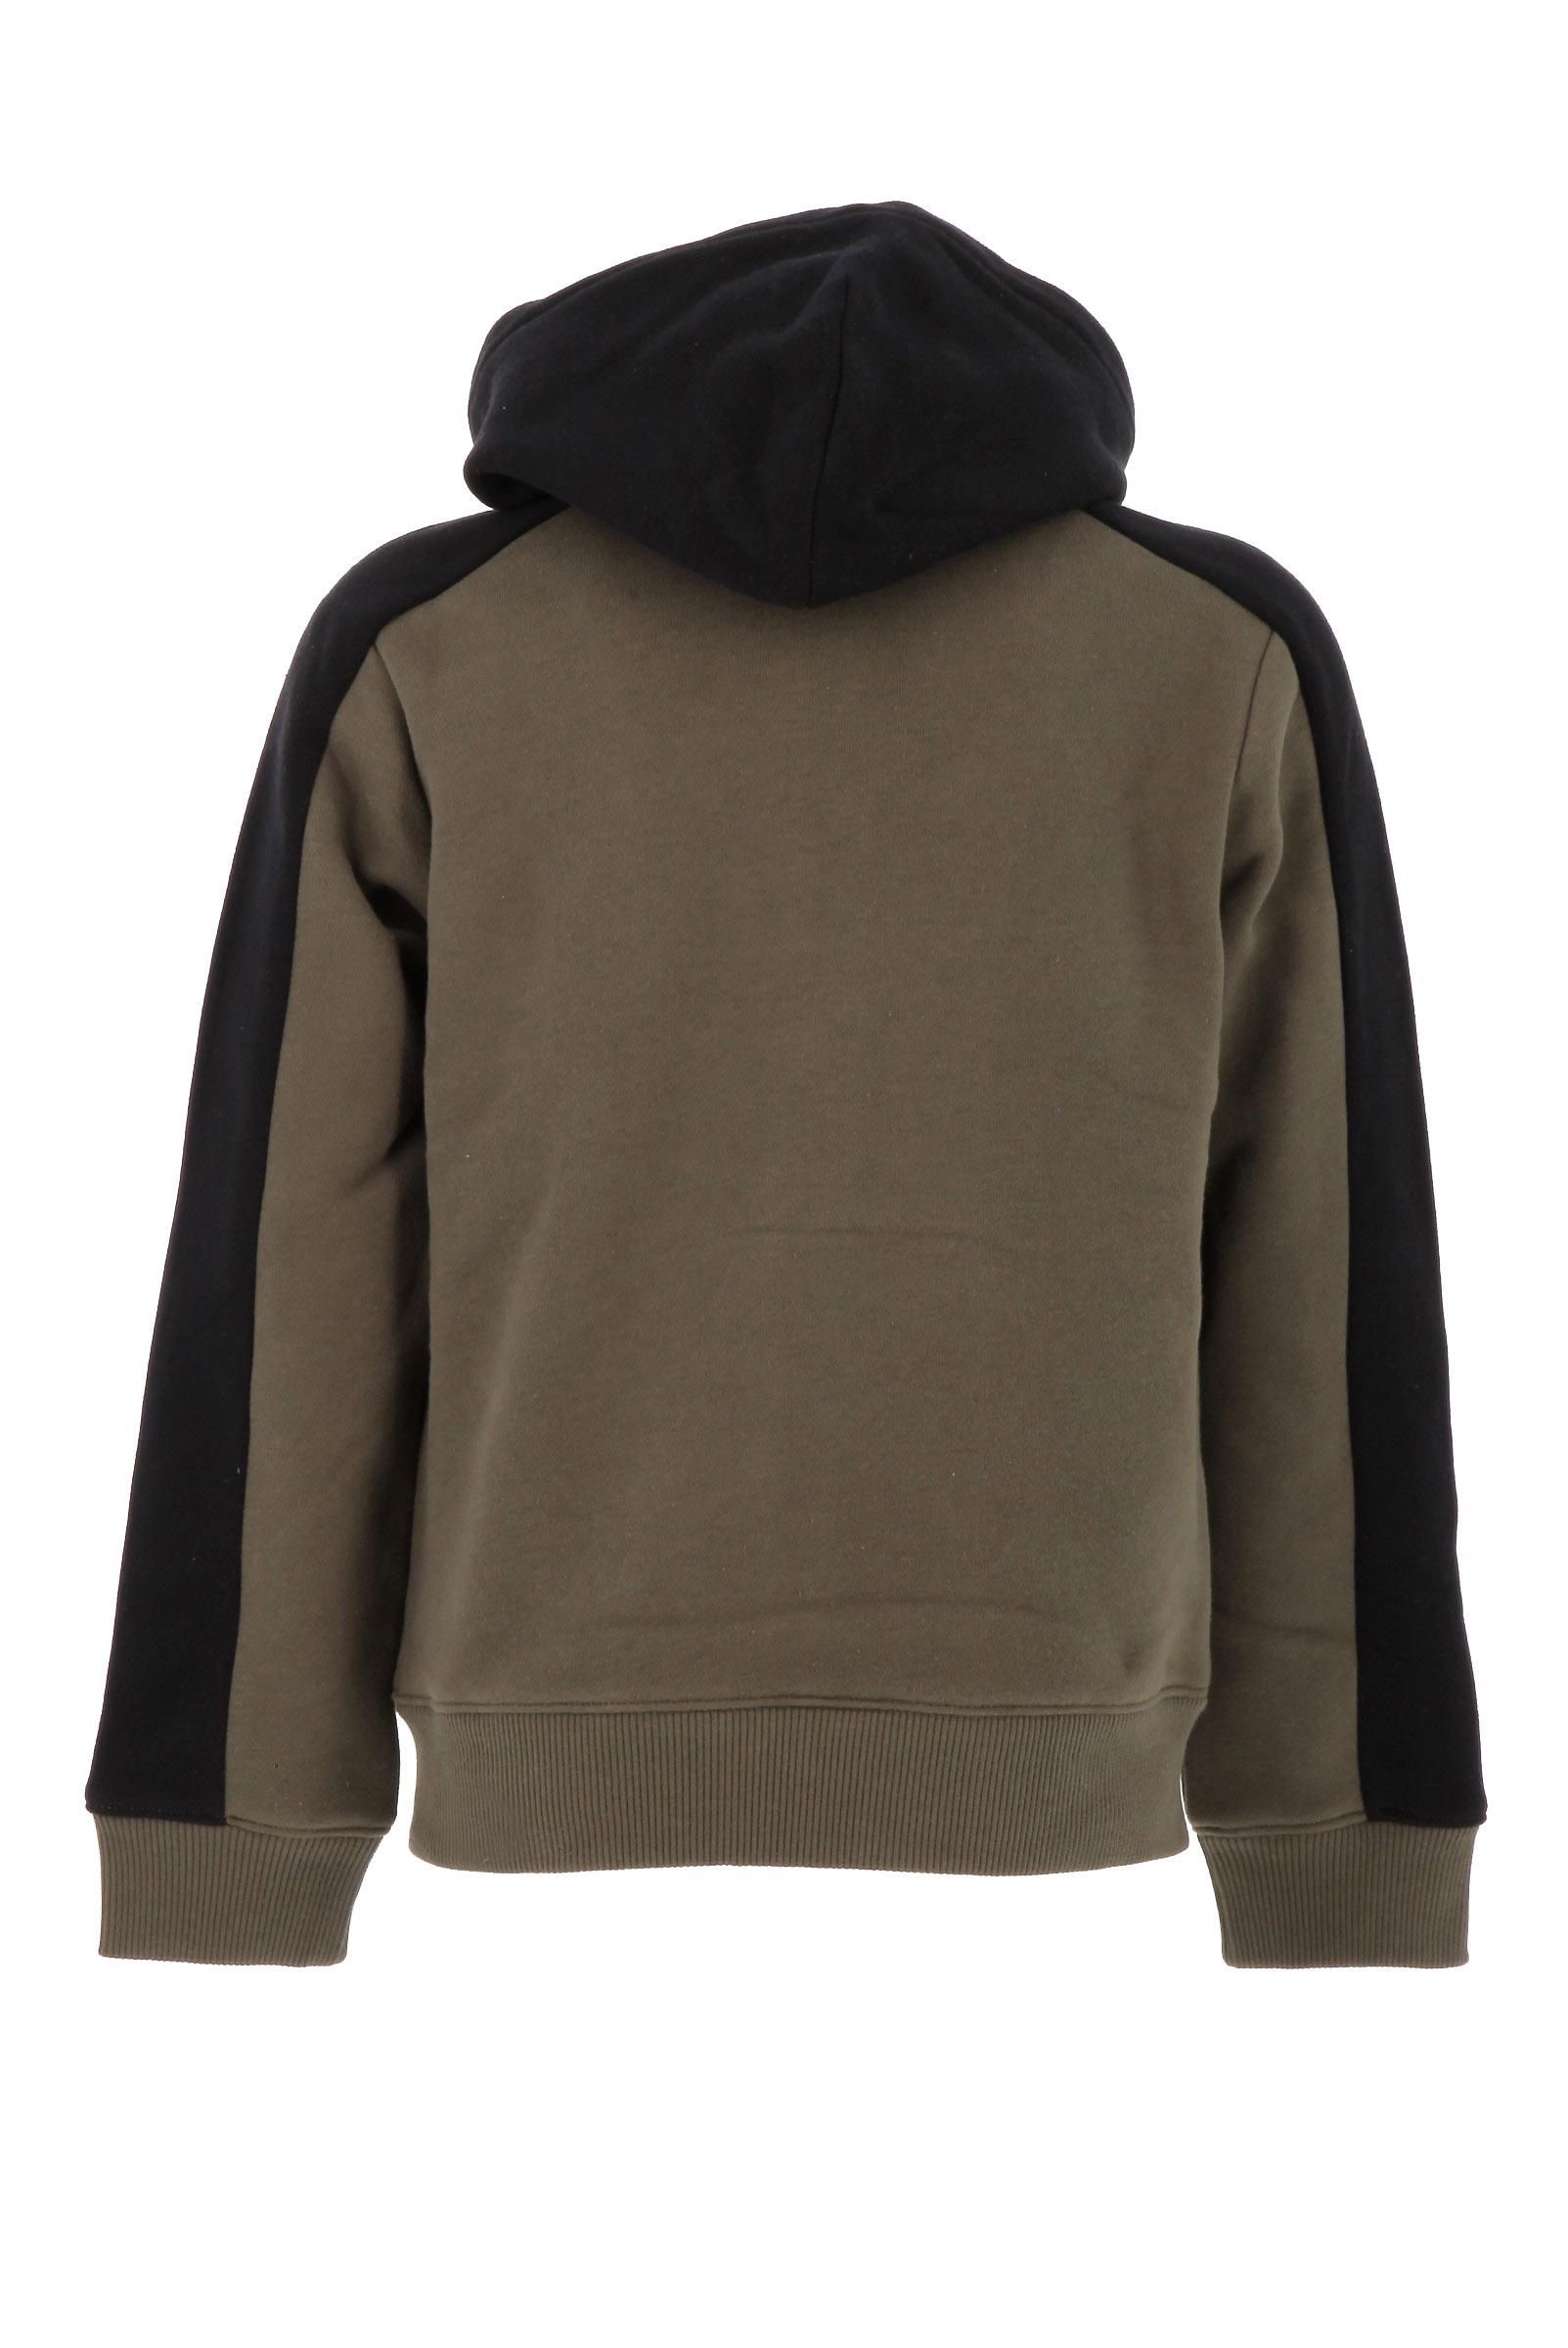 Sweatshirt with zip CALVIN KLEIN   Sweatshirt   IB0IB00675LFH